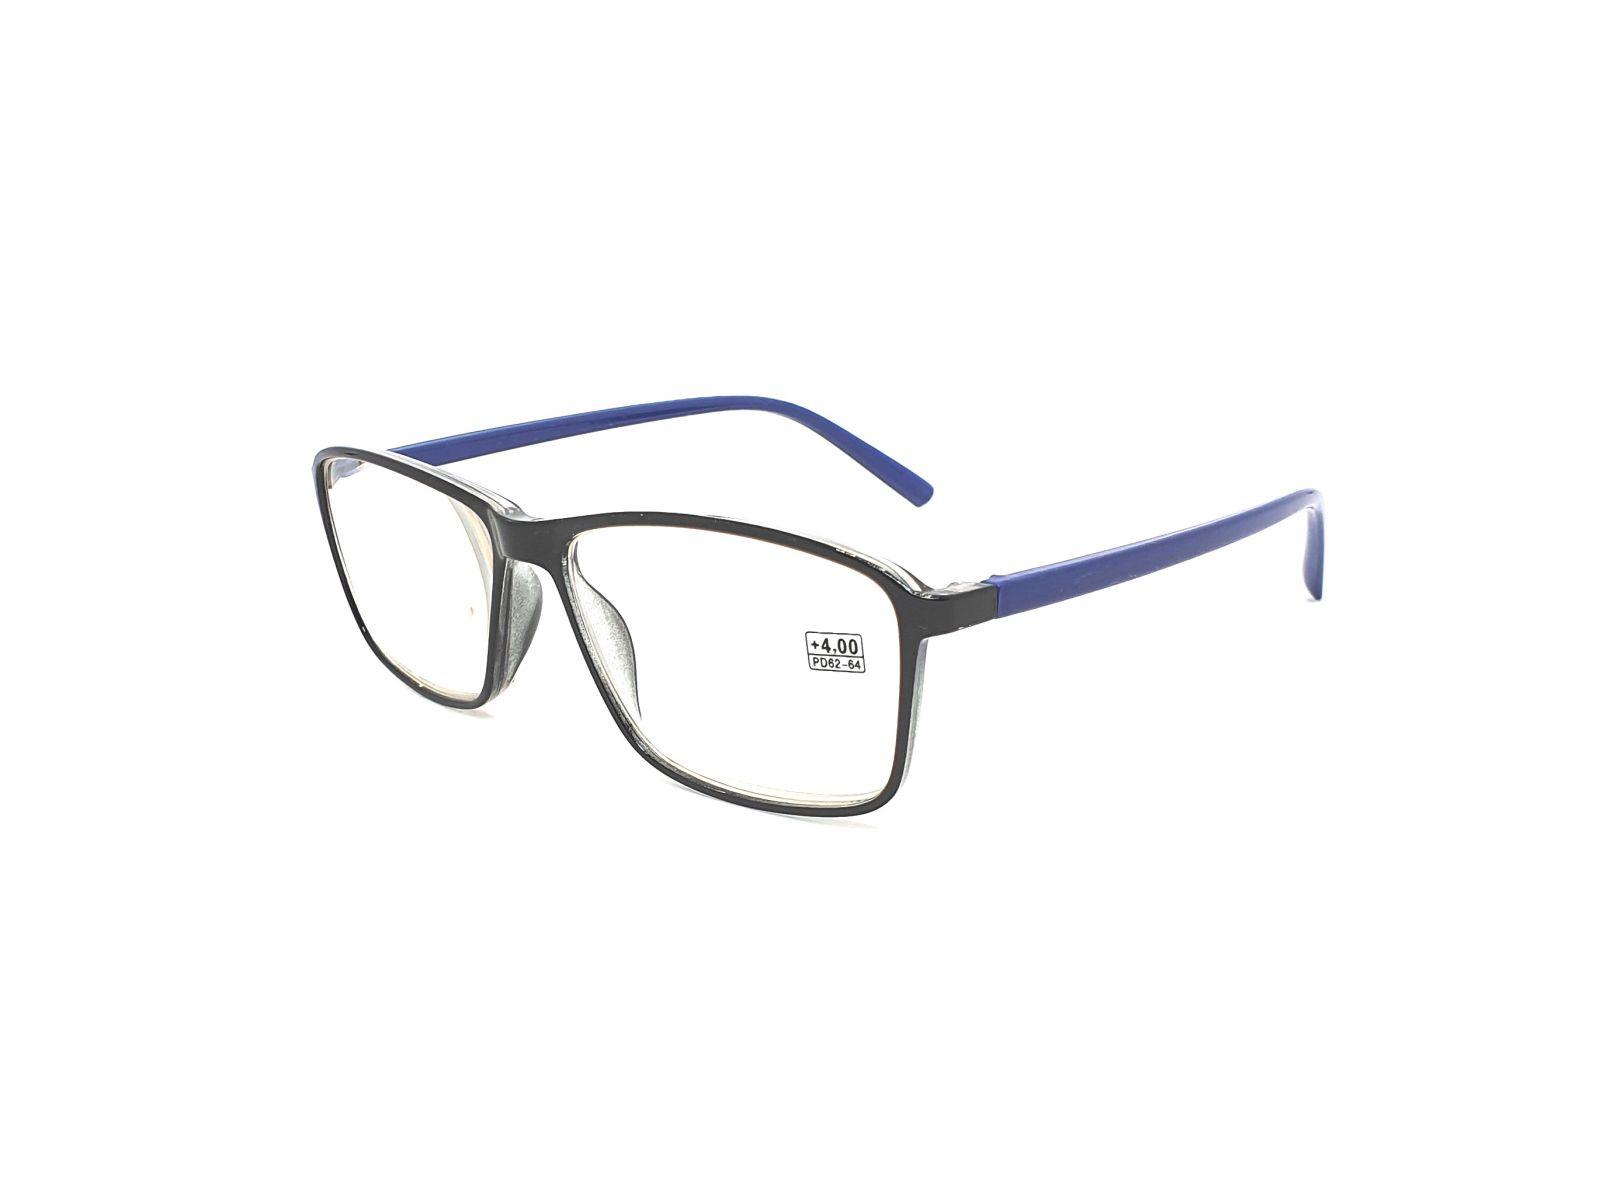 Dioptrické brýle 17218 / +3,50 blue